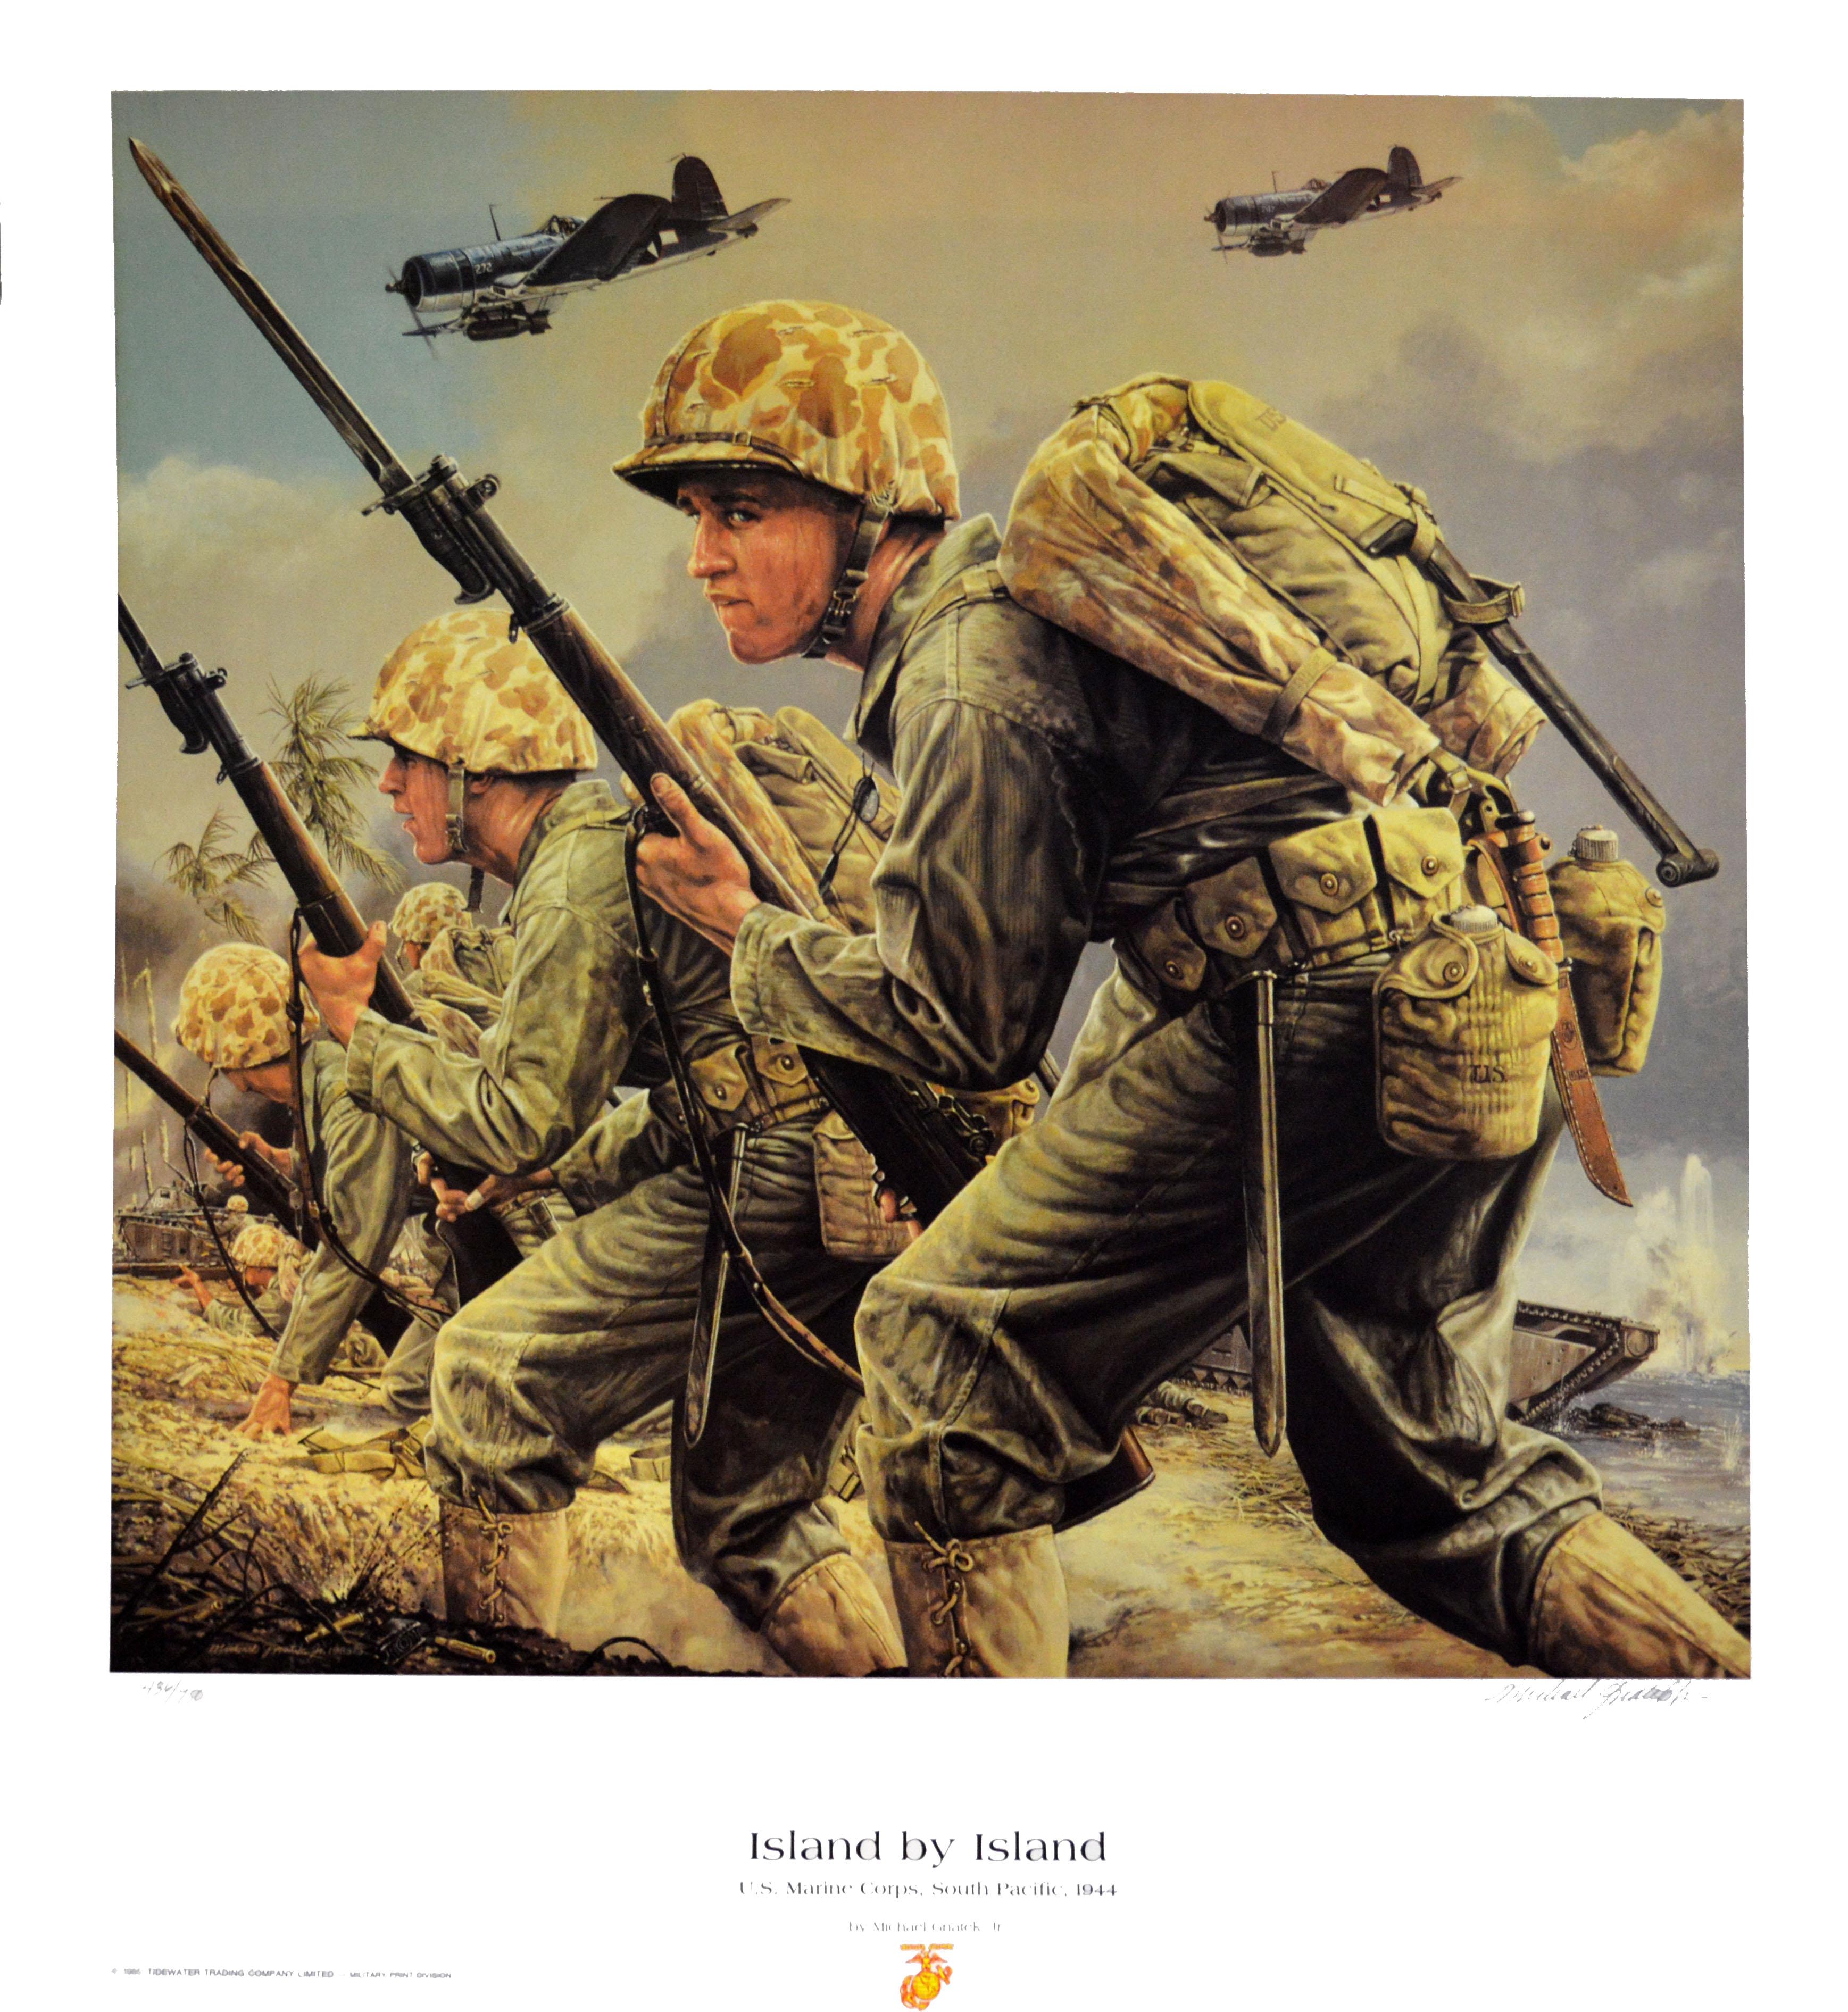 Island By Island U S Marine Corps South Pacific 1944